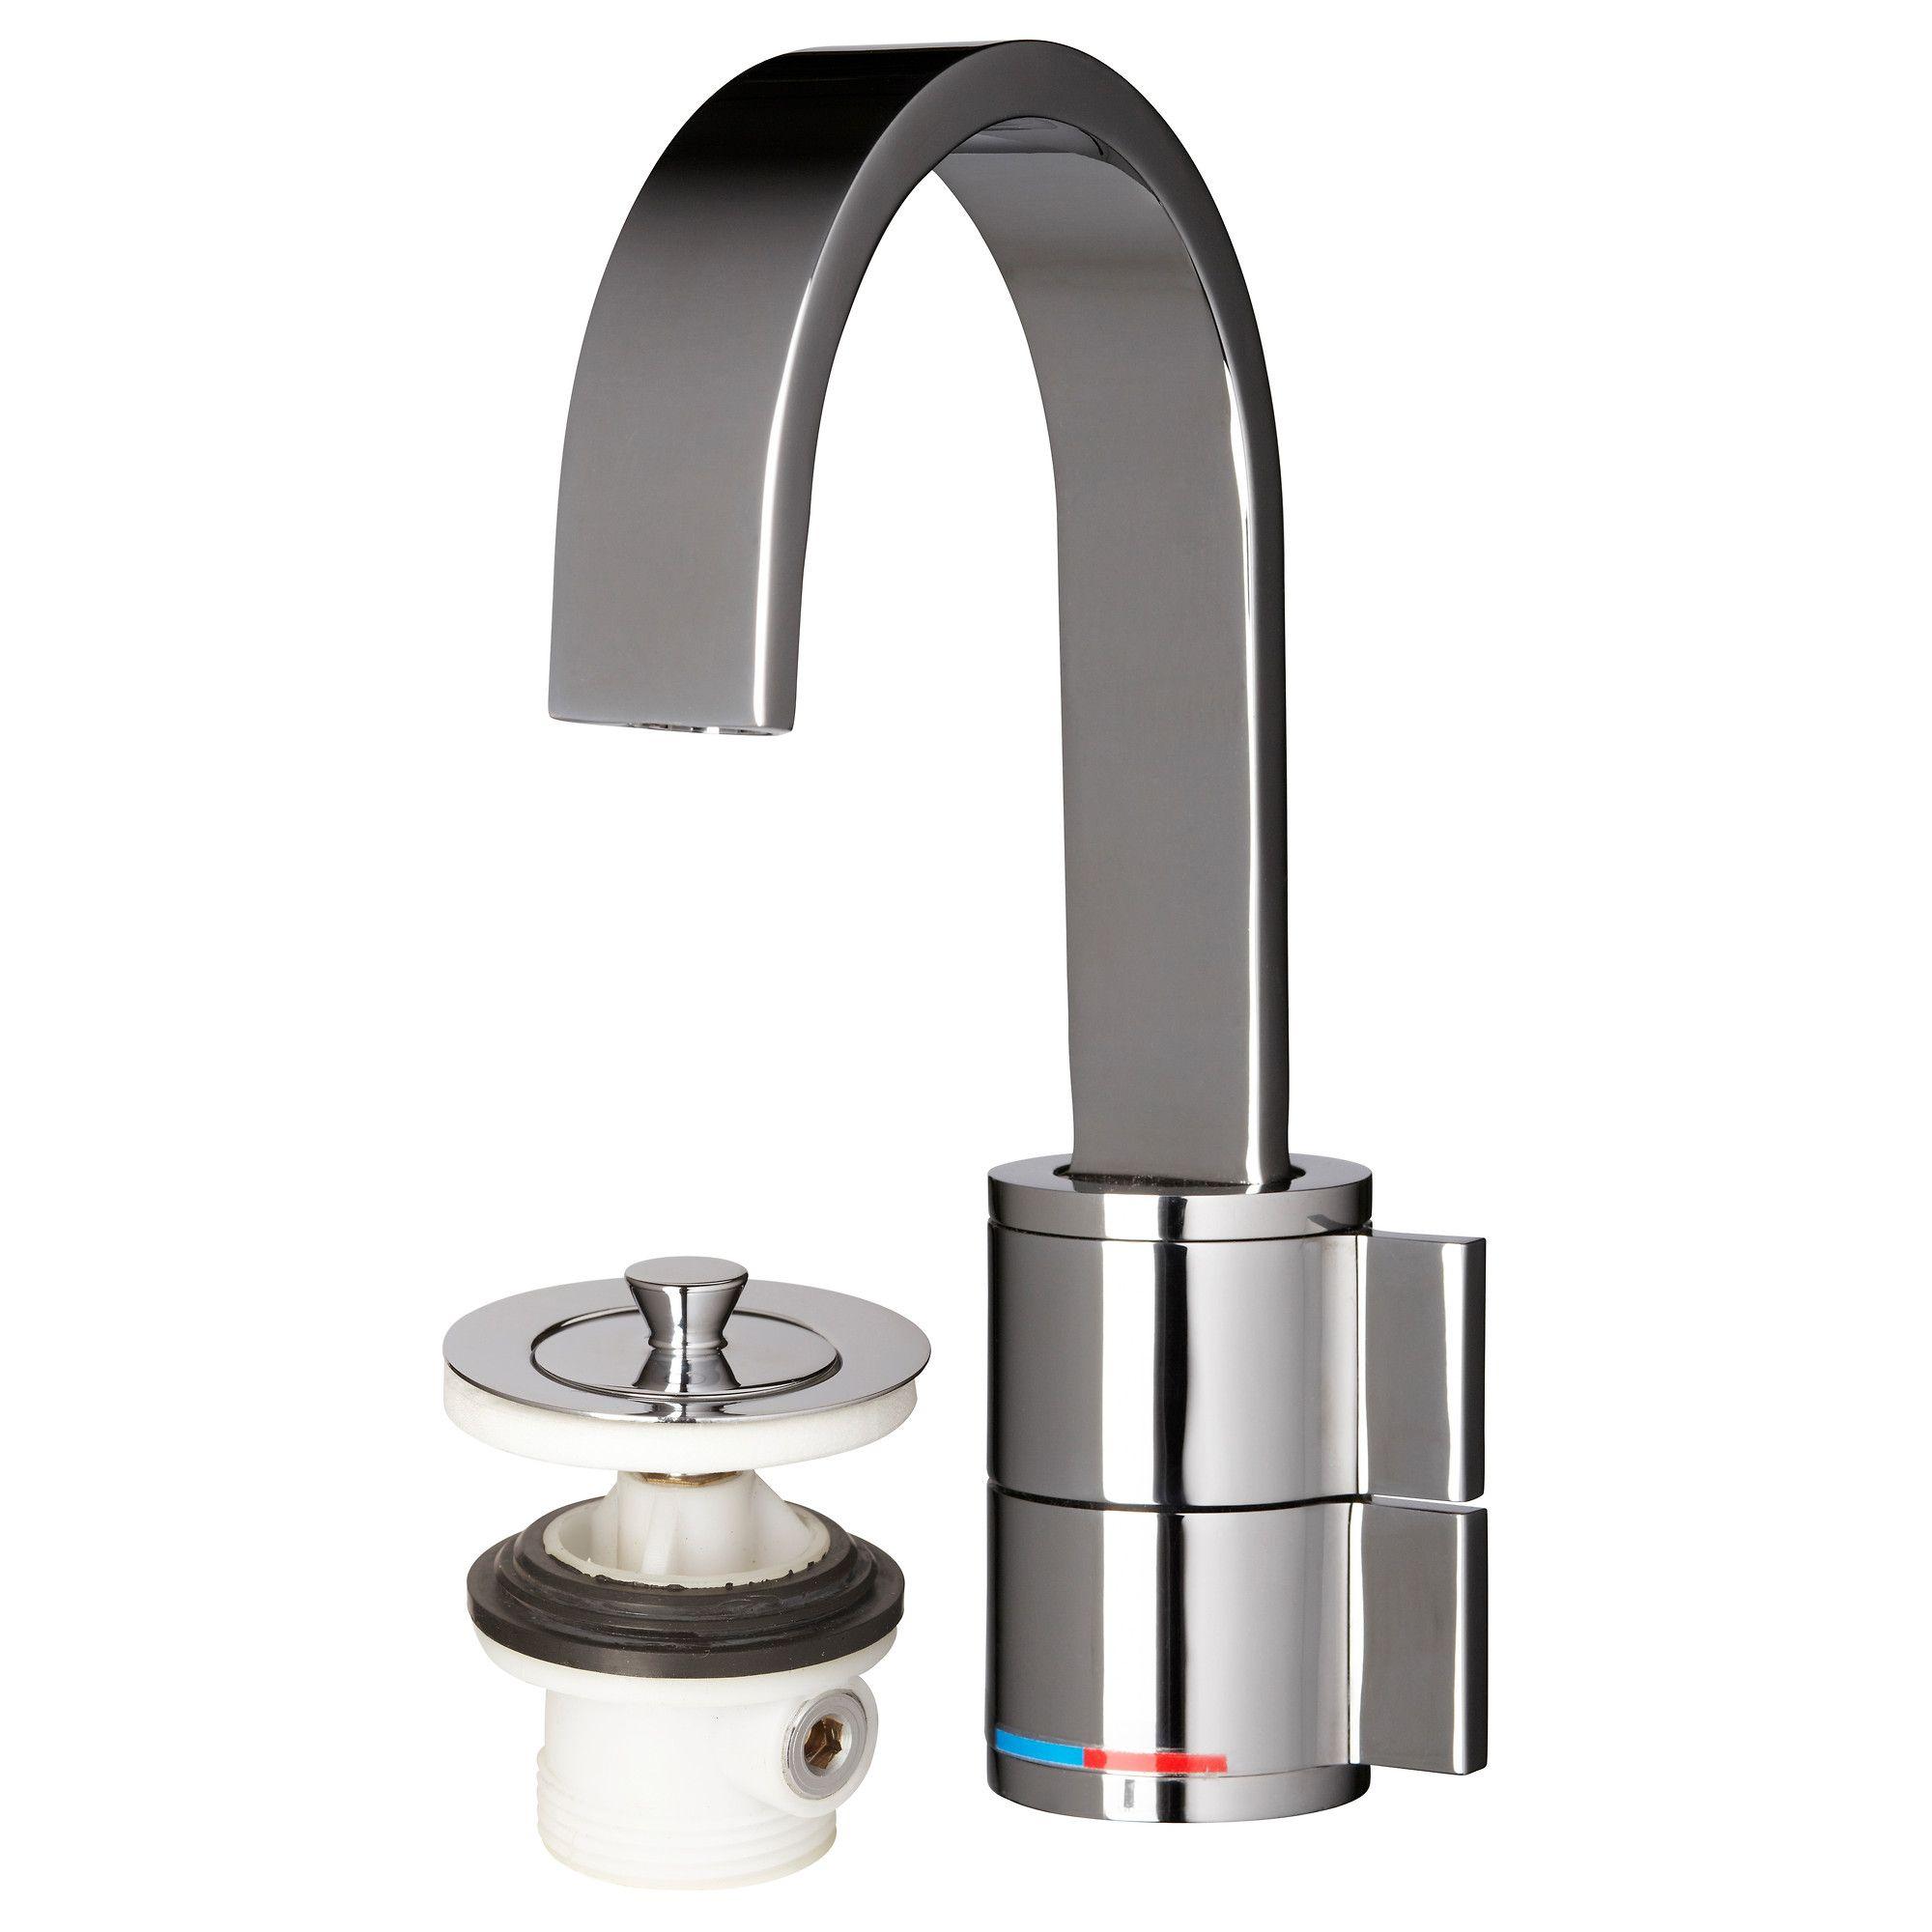 LEDSKÄR Bath faucet with strainer - IKEA, $179.99 | PROJECT mansard ...